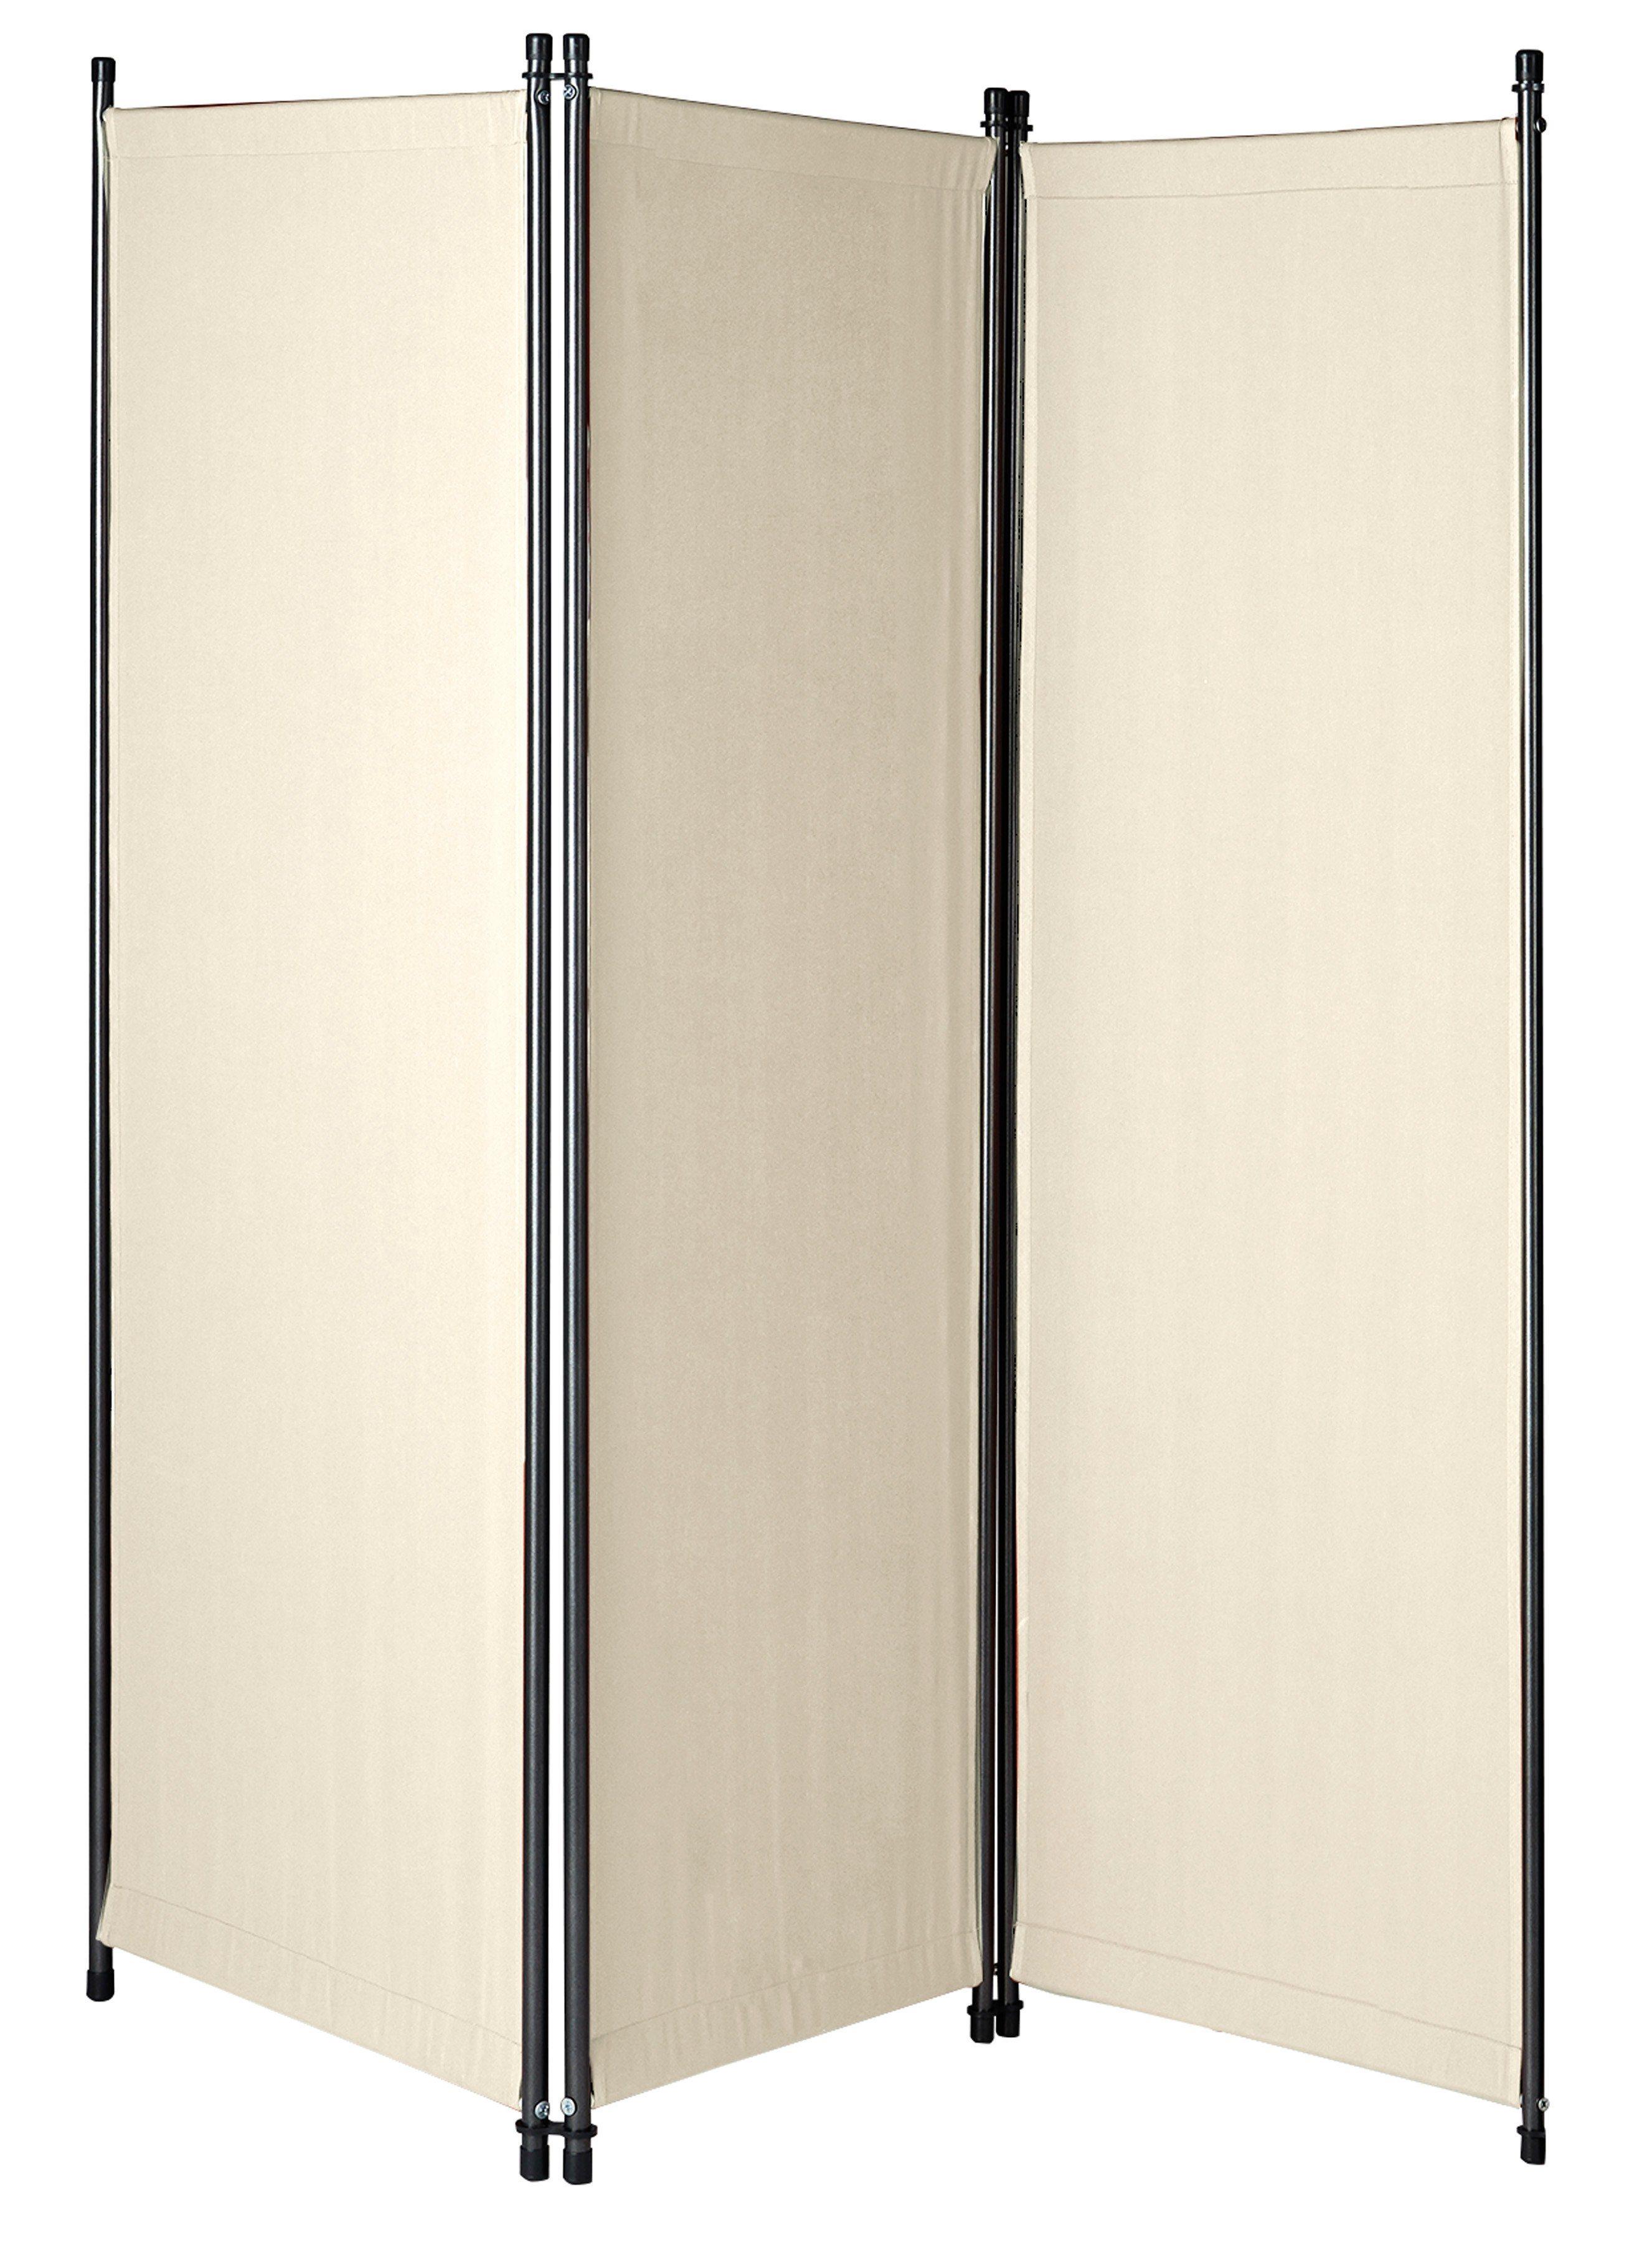 Paravent »Swingtex«, (B/H): ca. 165x165 cm | Wohnzimmer > Regale > Raumteiler